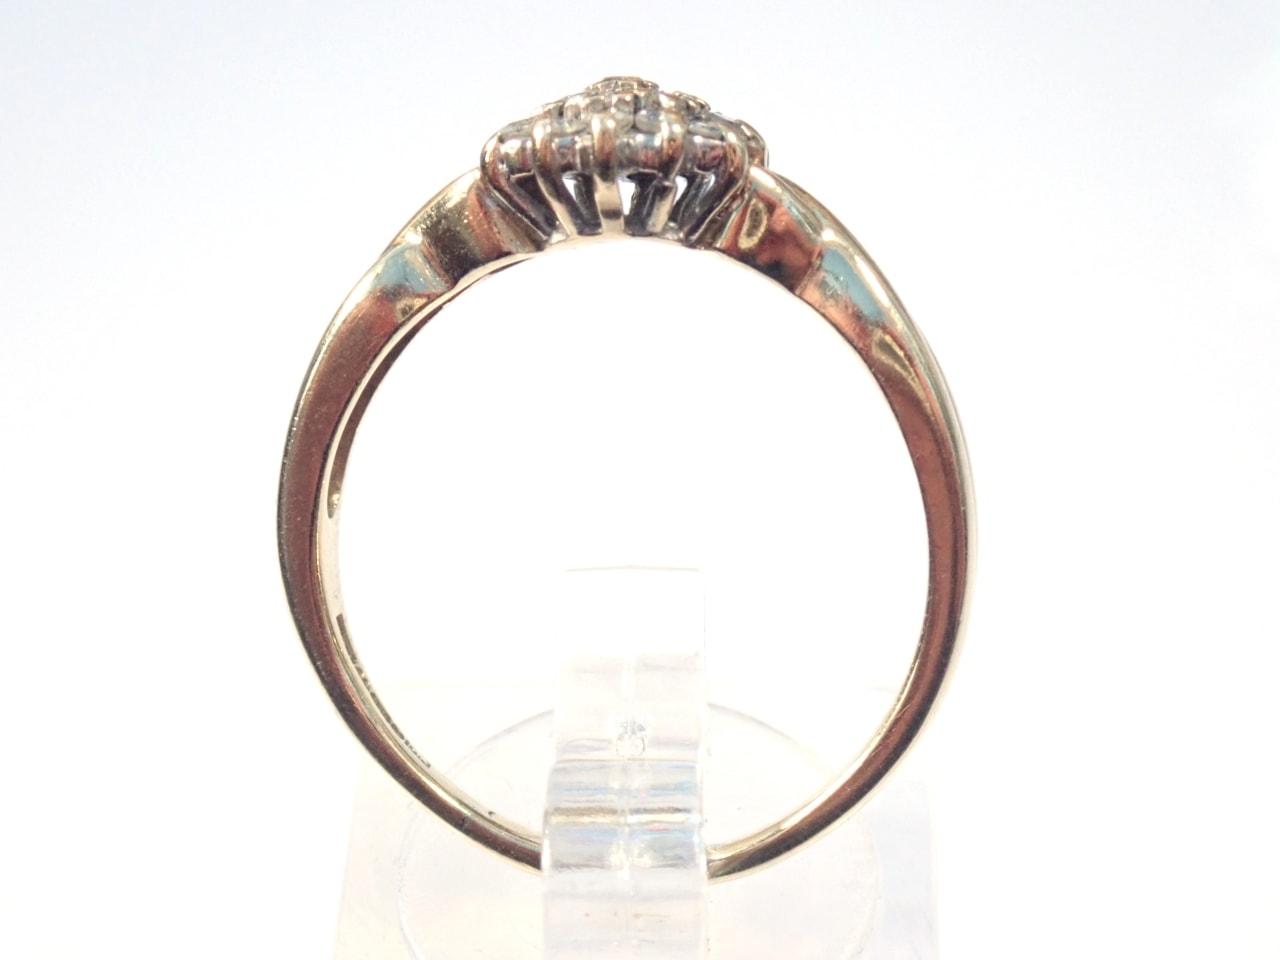 Diamond Cluster Ring - 9K Yellow Gold Size R -3.1 grams #63